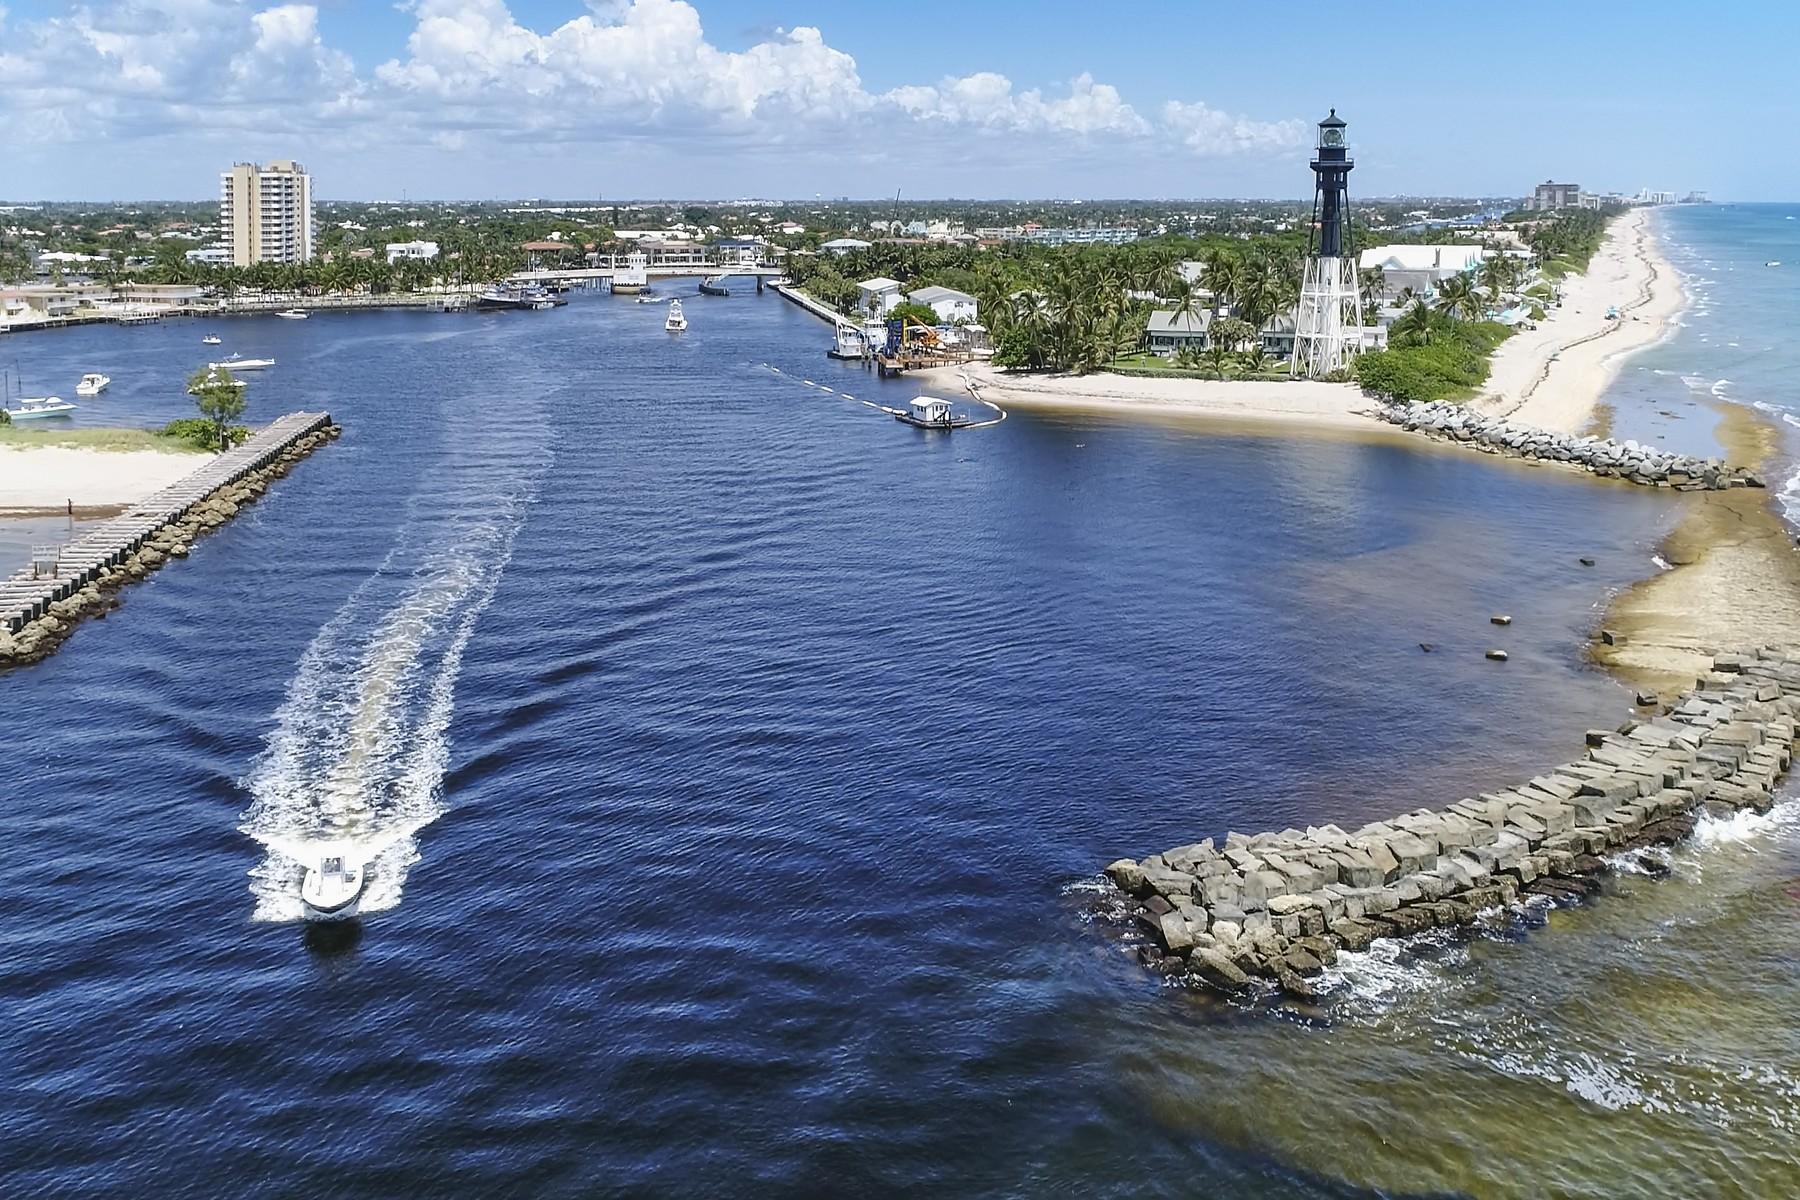 تاون هاوس للـ Sale في 1786 Bay Dr, Hillsboro Beach, FL 33062 1786 Bay Dr, Hillsboro Beach, Florida, 33062 United States